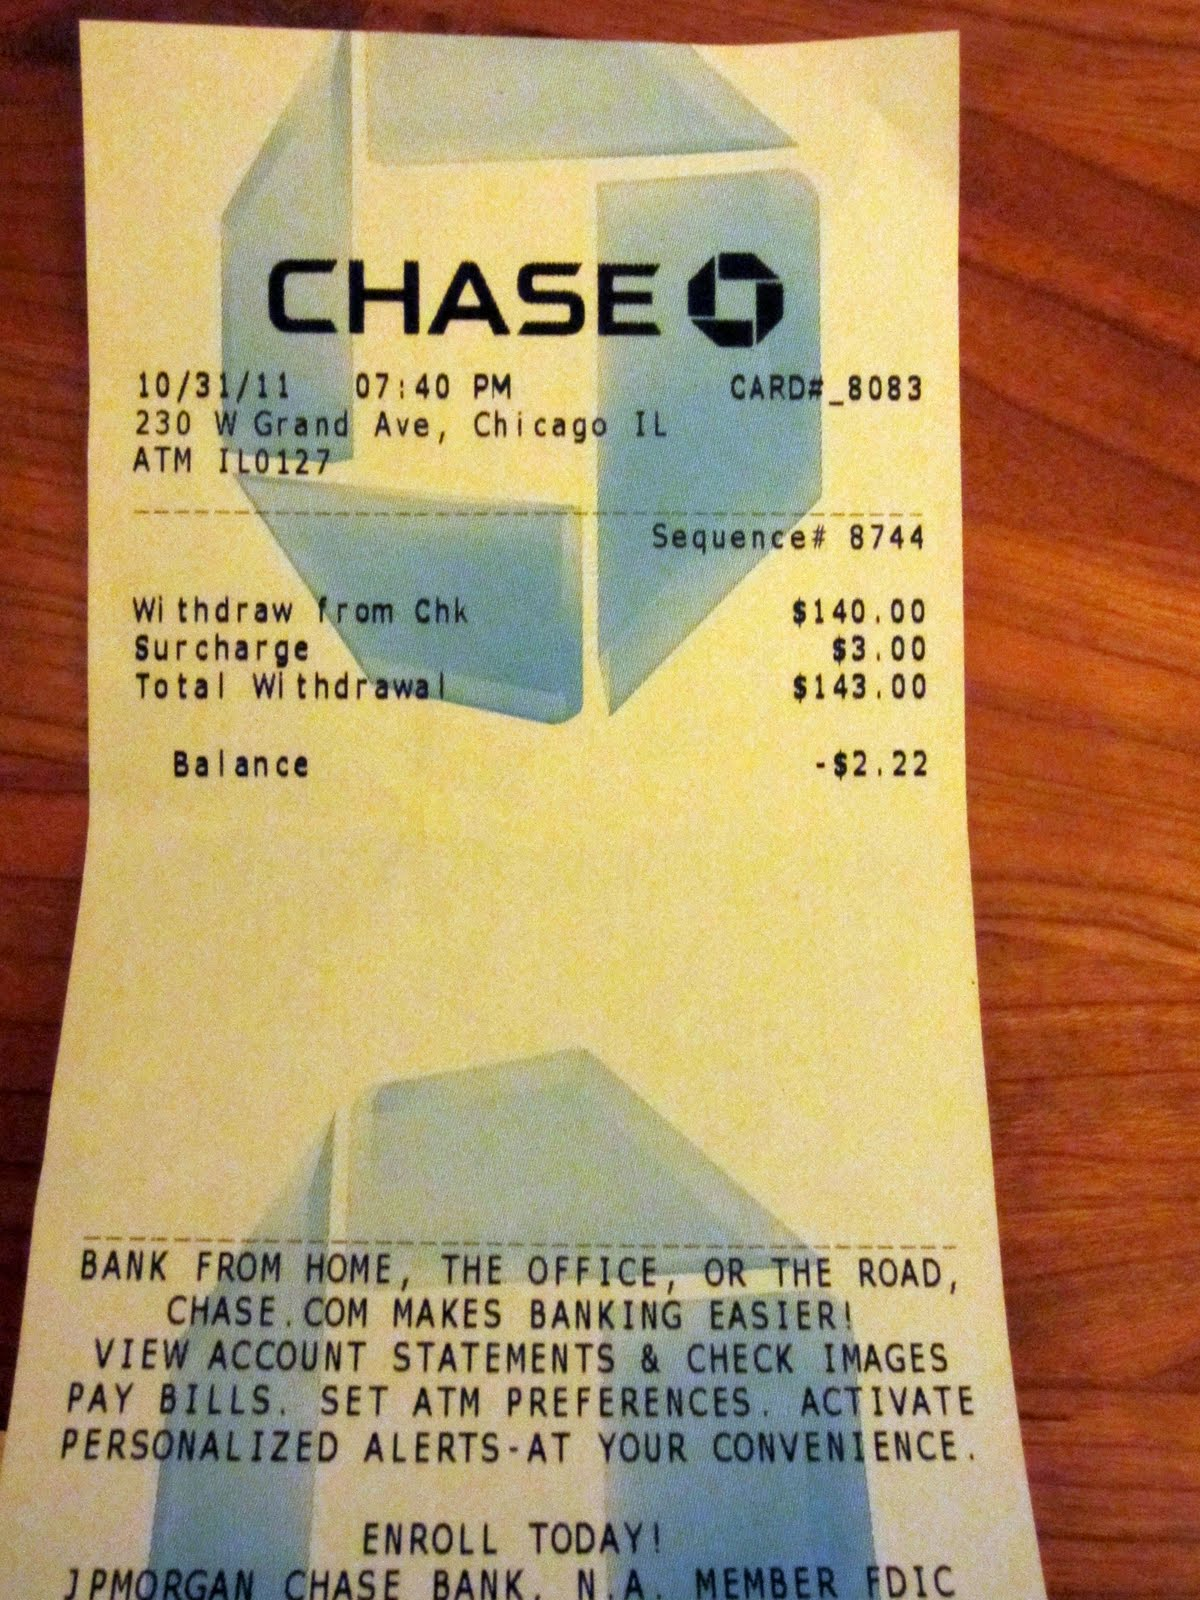 Chase Field receipt ExpressExpense Custom Receipt